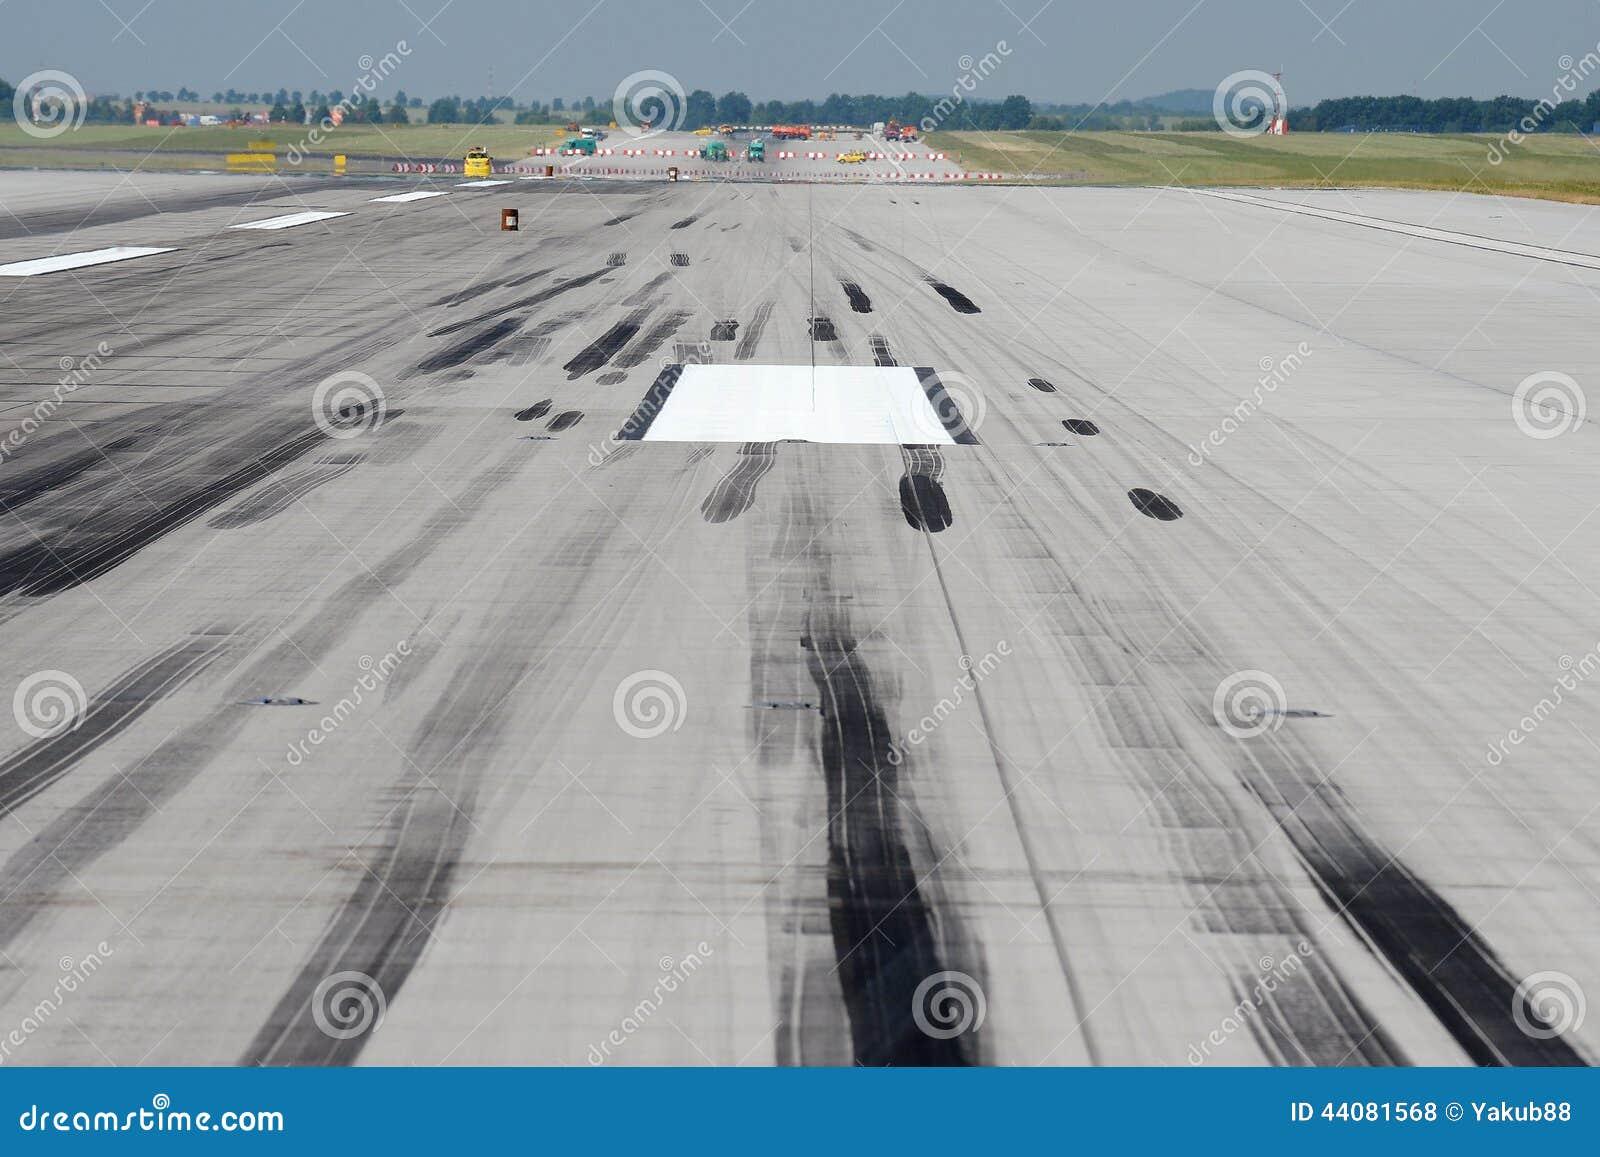 skid marks on runway stock photo image of marks traveling 44081568